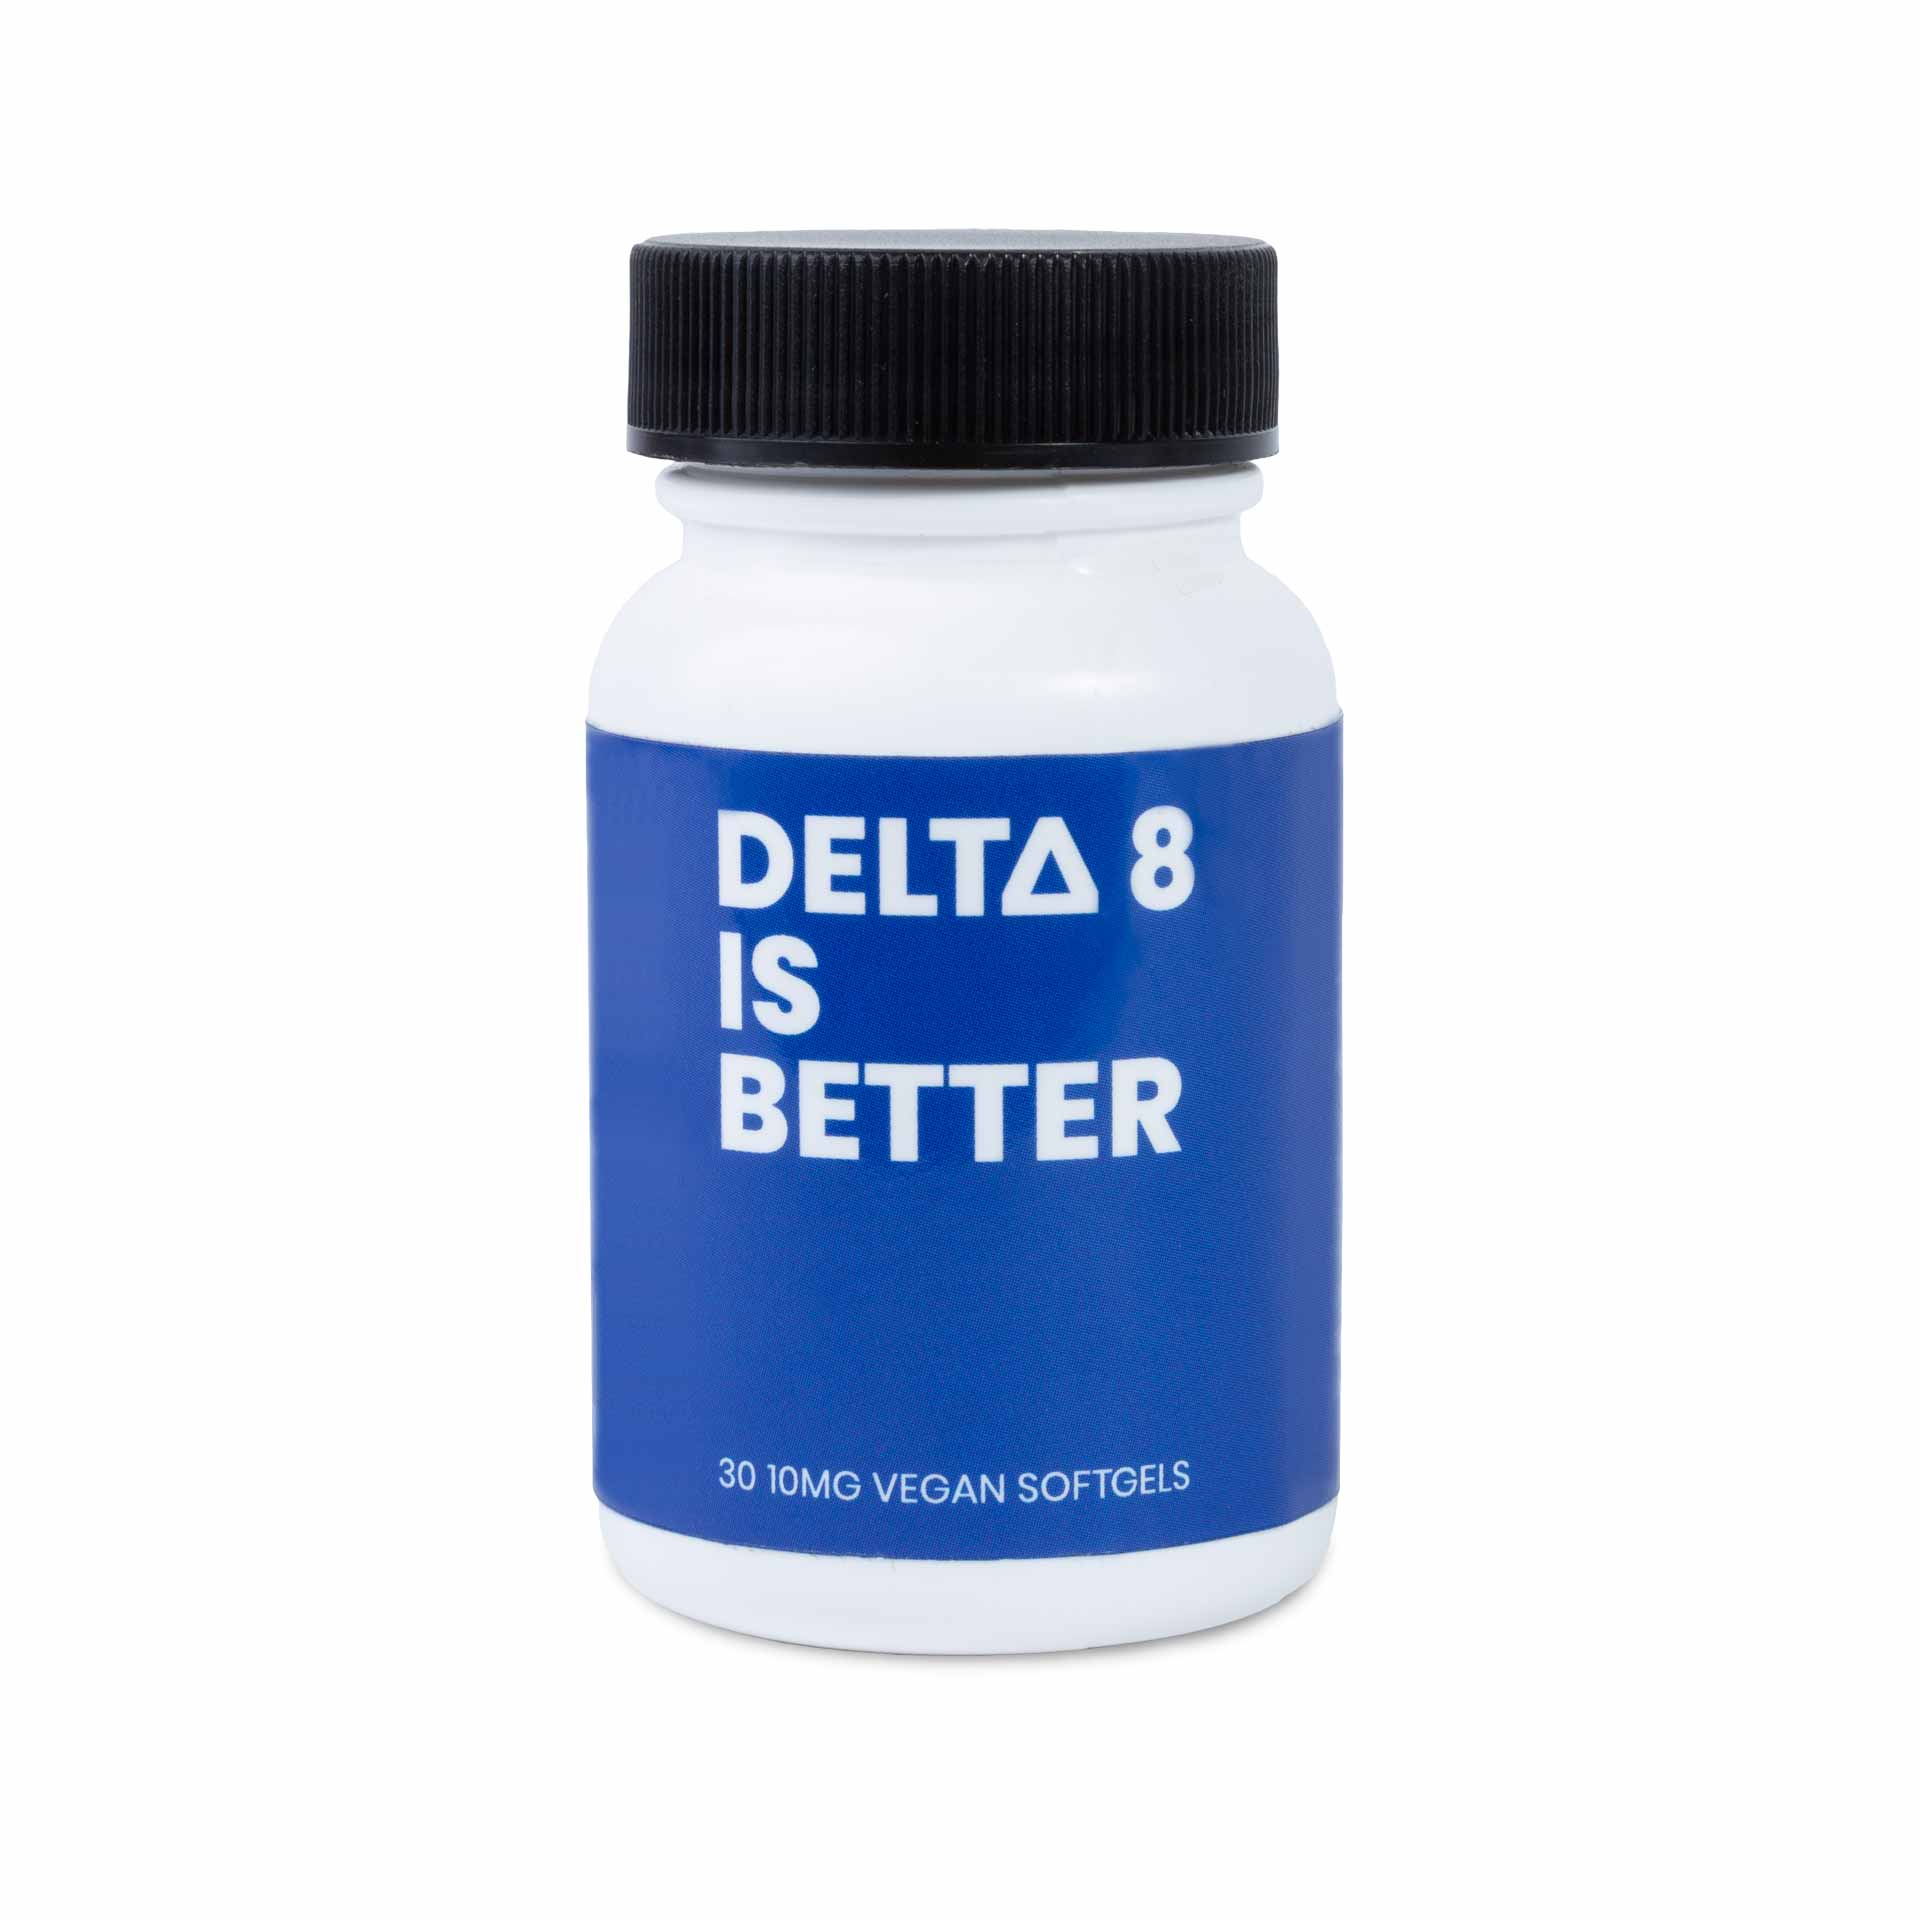 DELTA 8 IS BETTER 10MG VEGAN SOFTGELS 30-CT BOTTLE